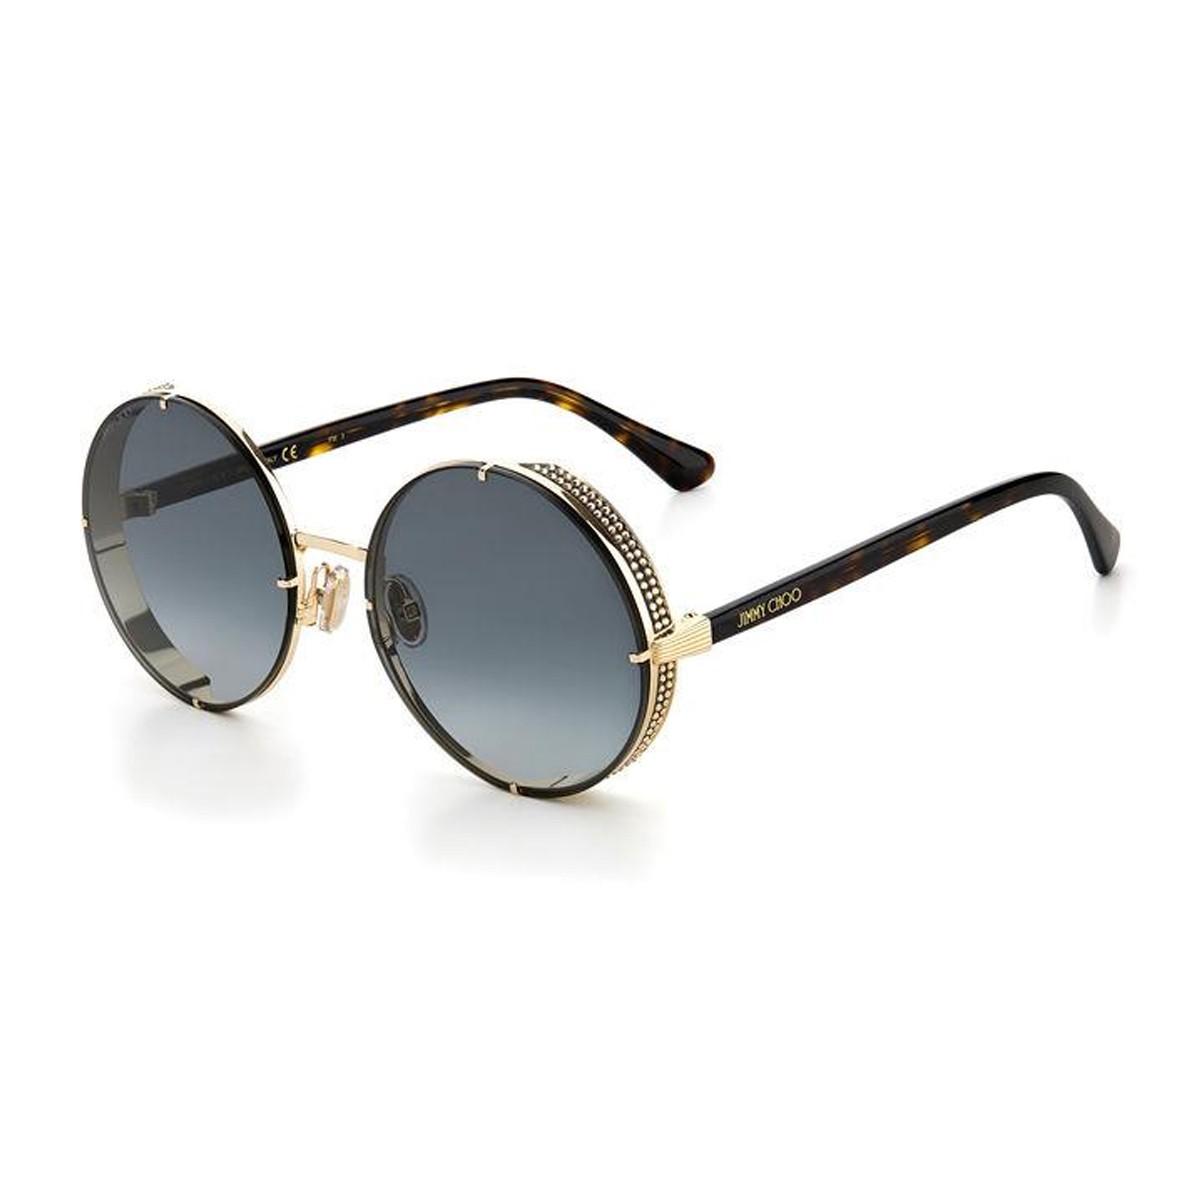 Jimmy Choo Lilo/s   Women's sunglasses